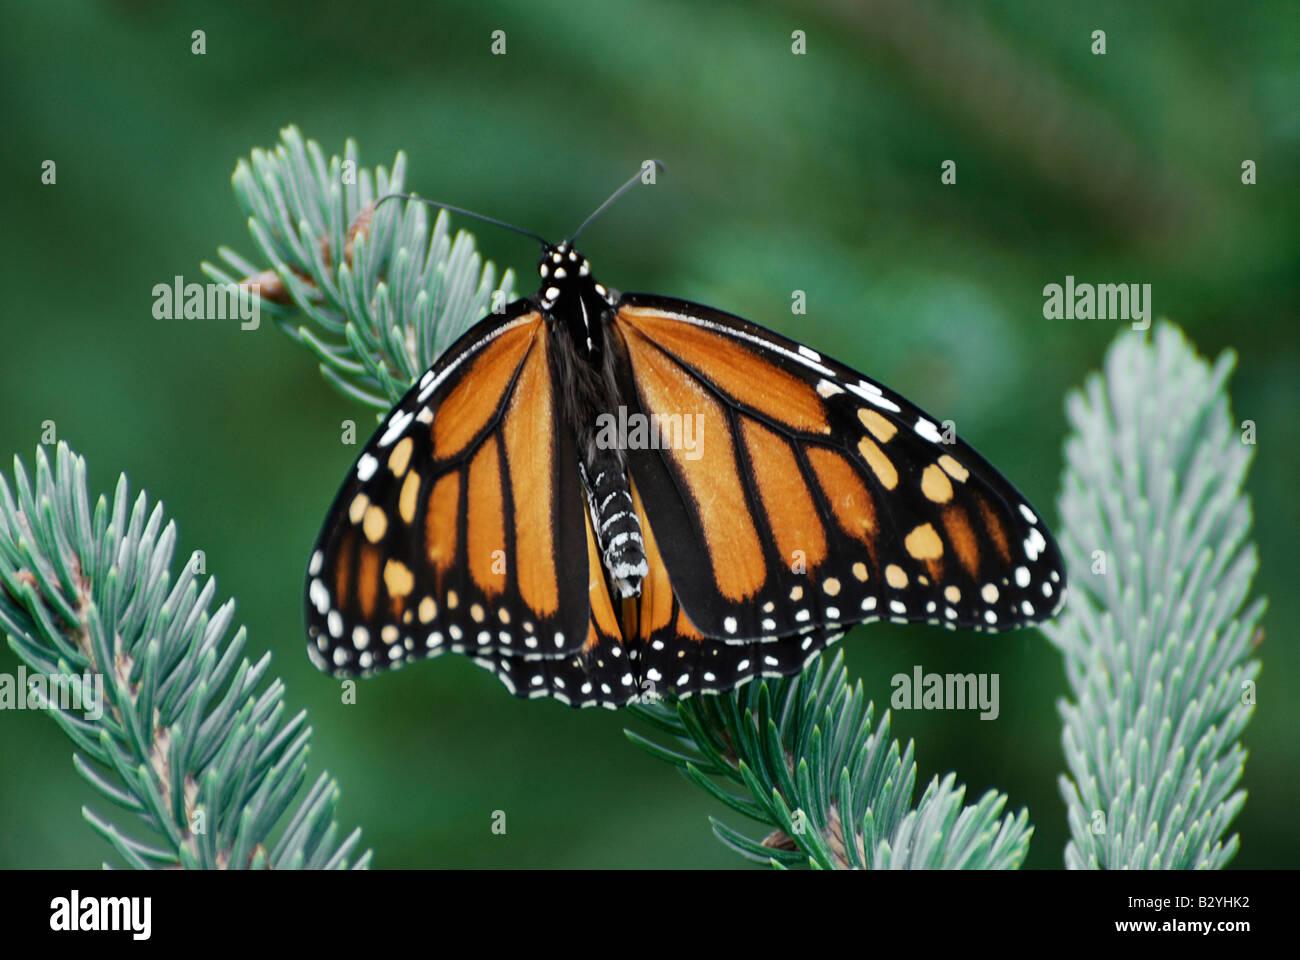 Monarch Butterfly (Danaus plexippus) - Stock Image